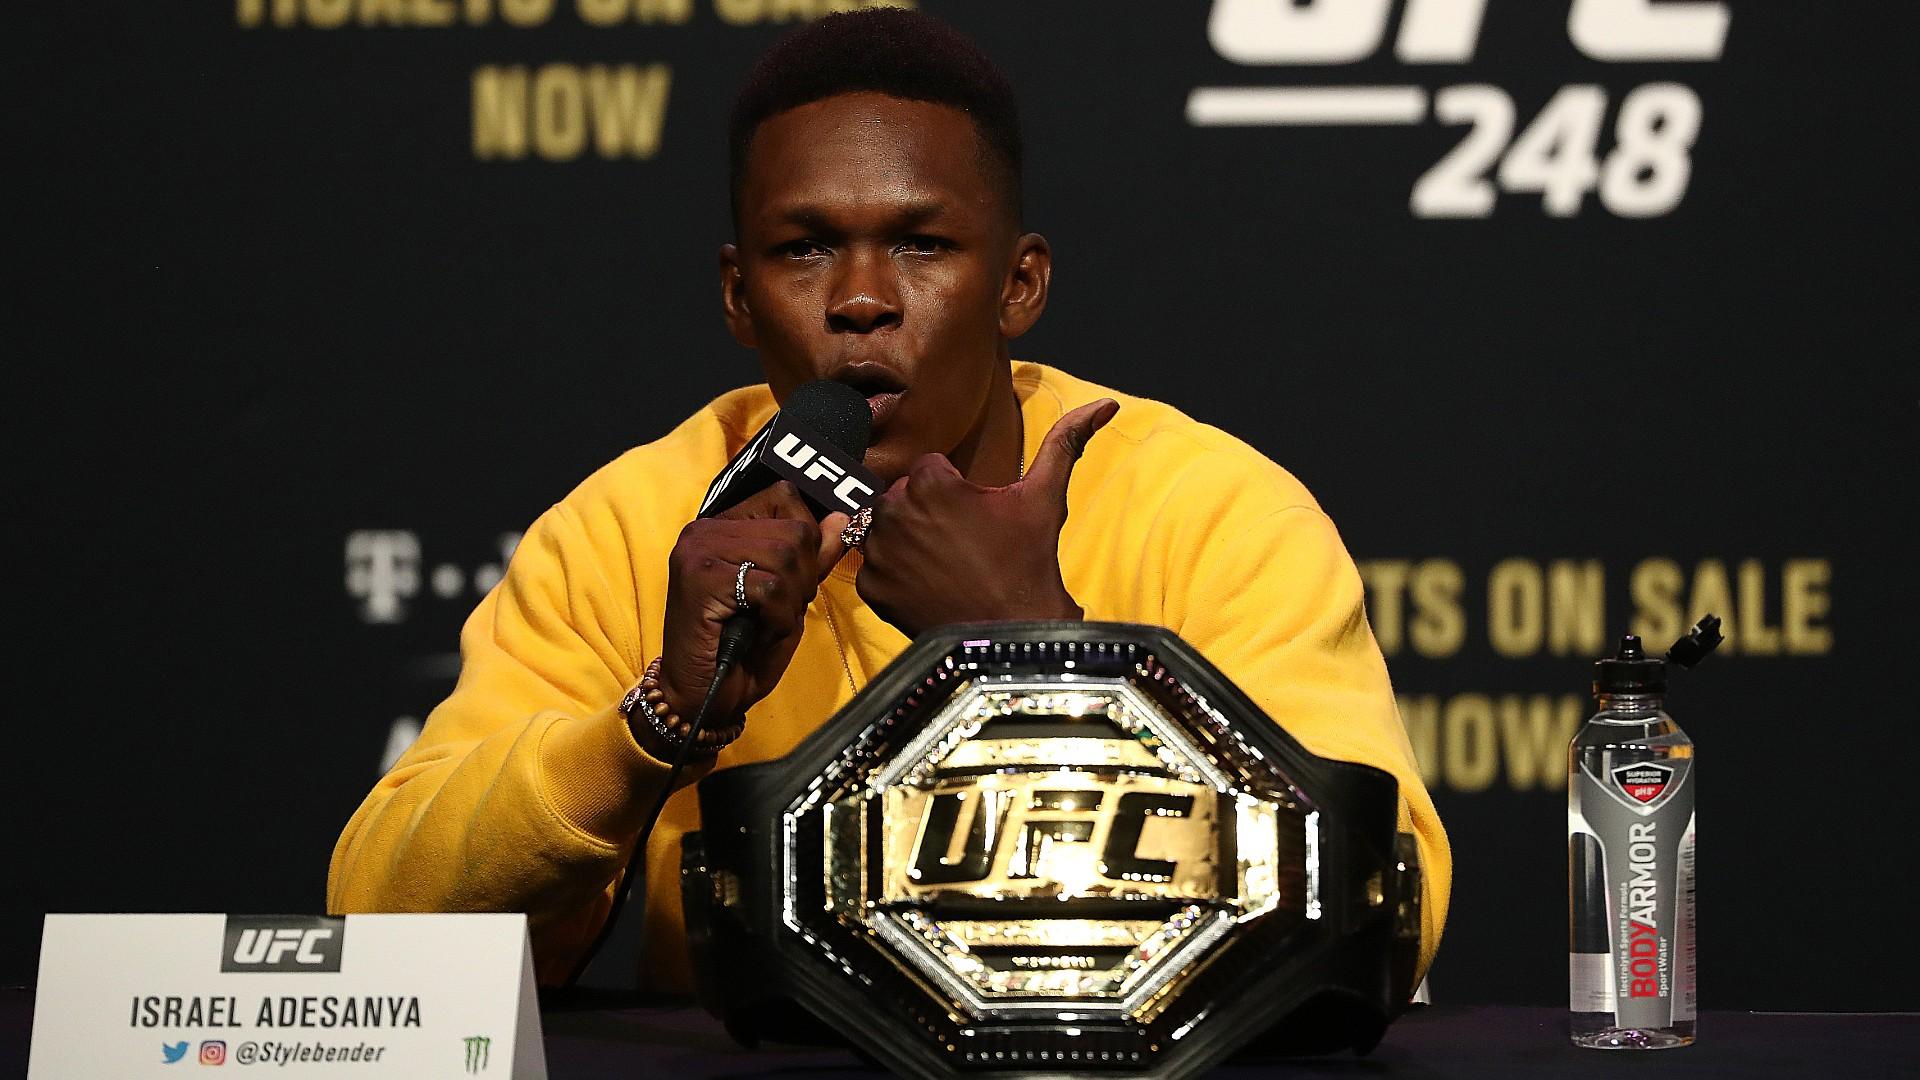 UFC 247: Israel Adesanya dice que Jon Jones se 'lavó' después de verlo superar a Dominick Reyes 2